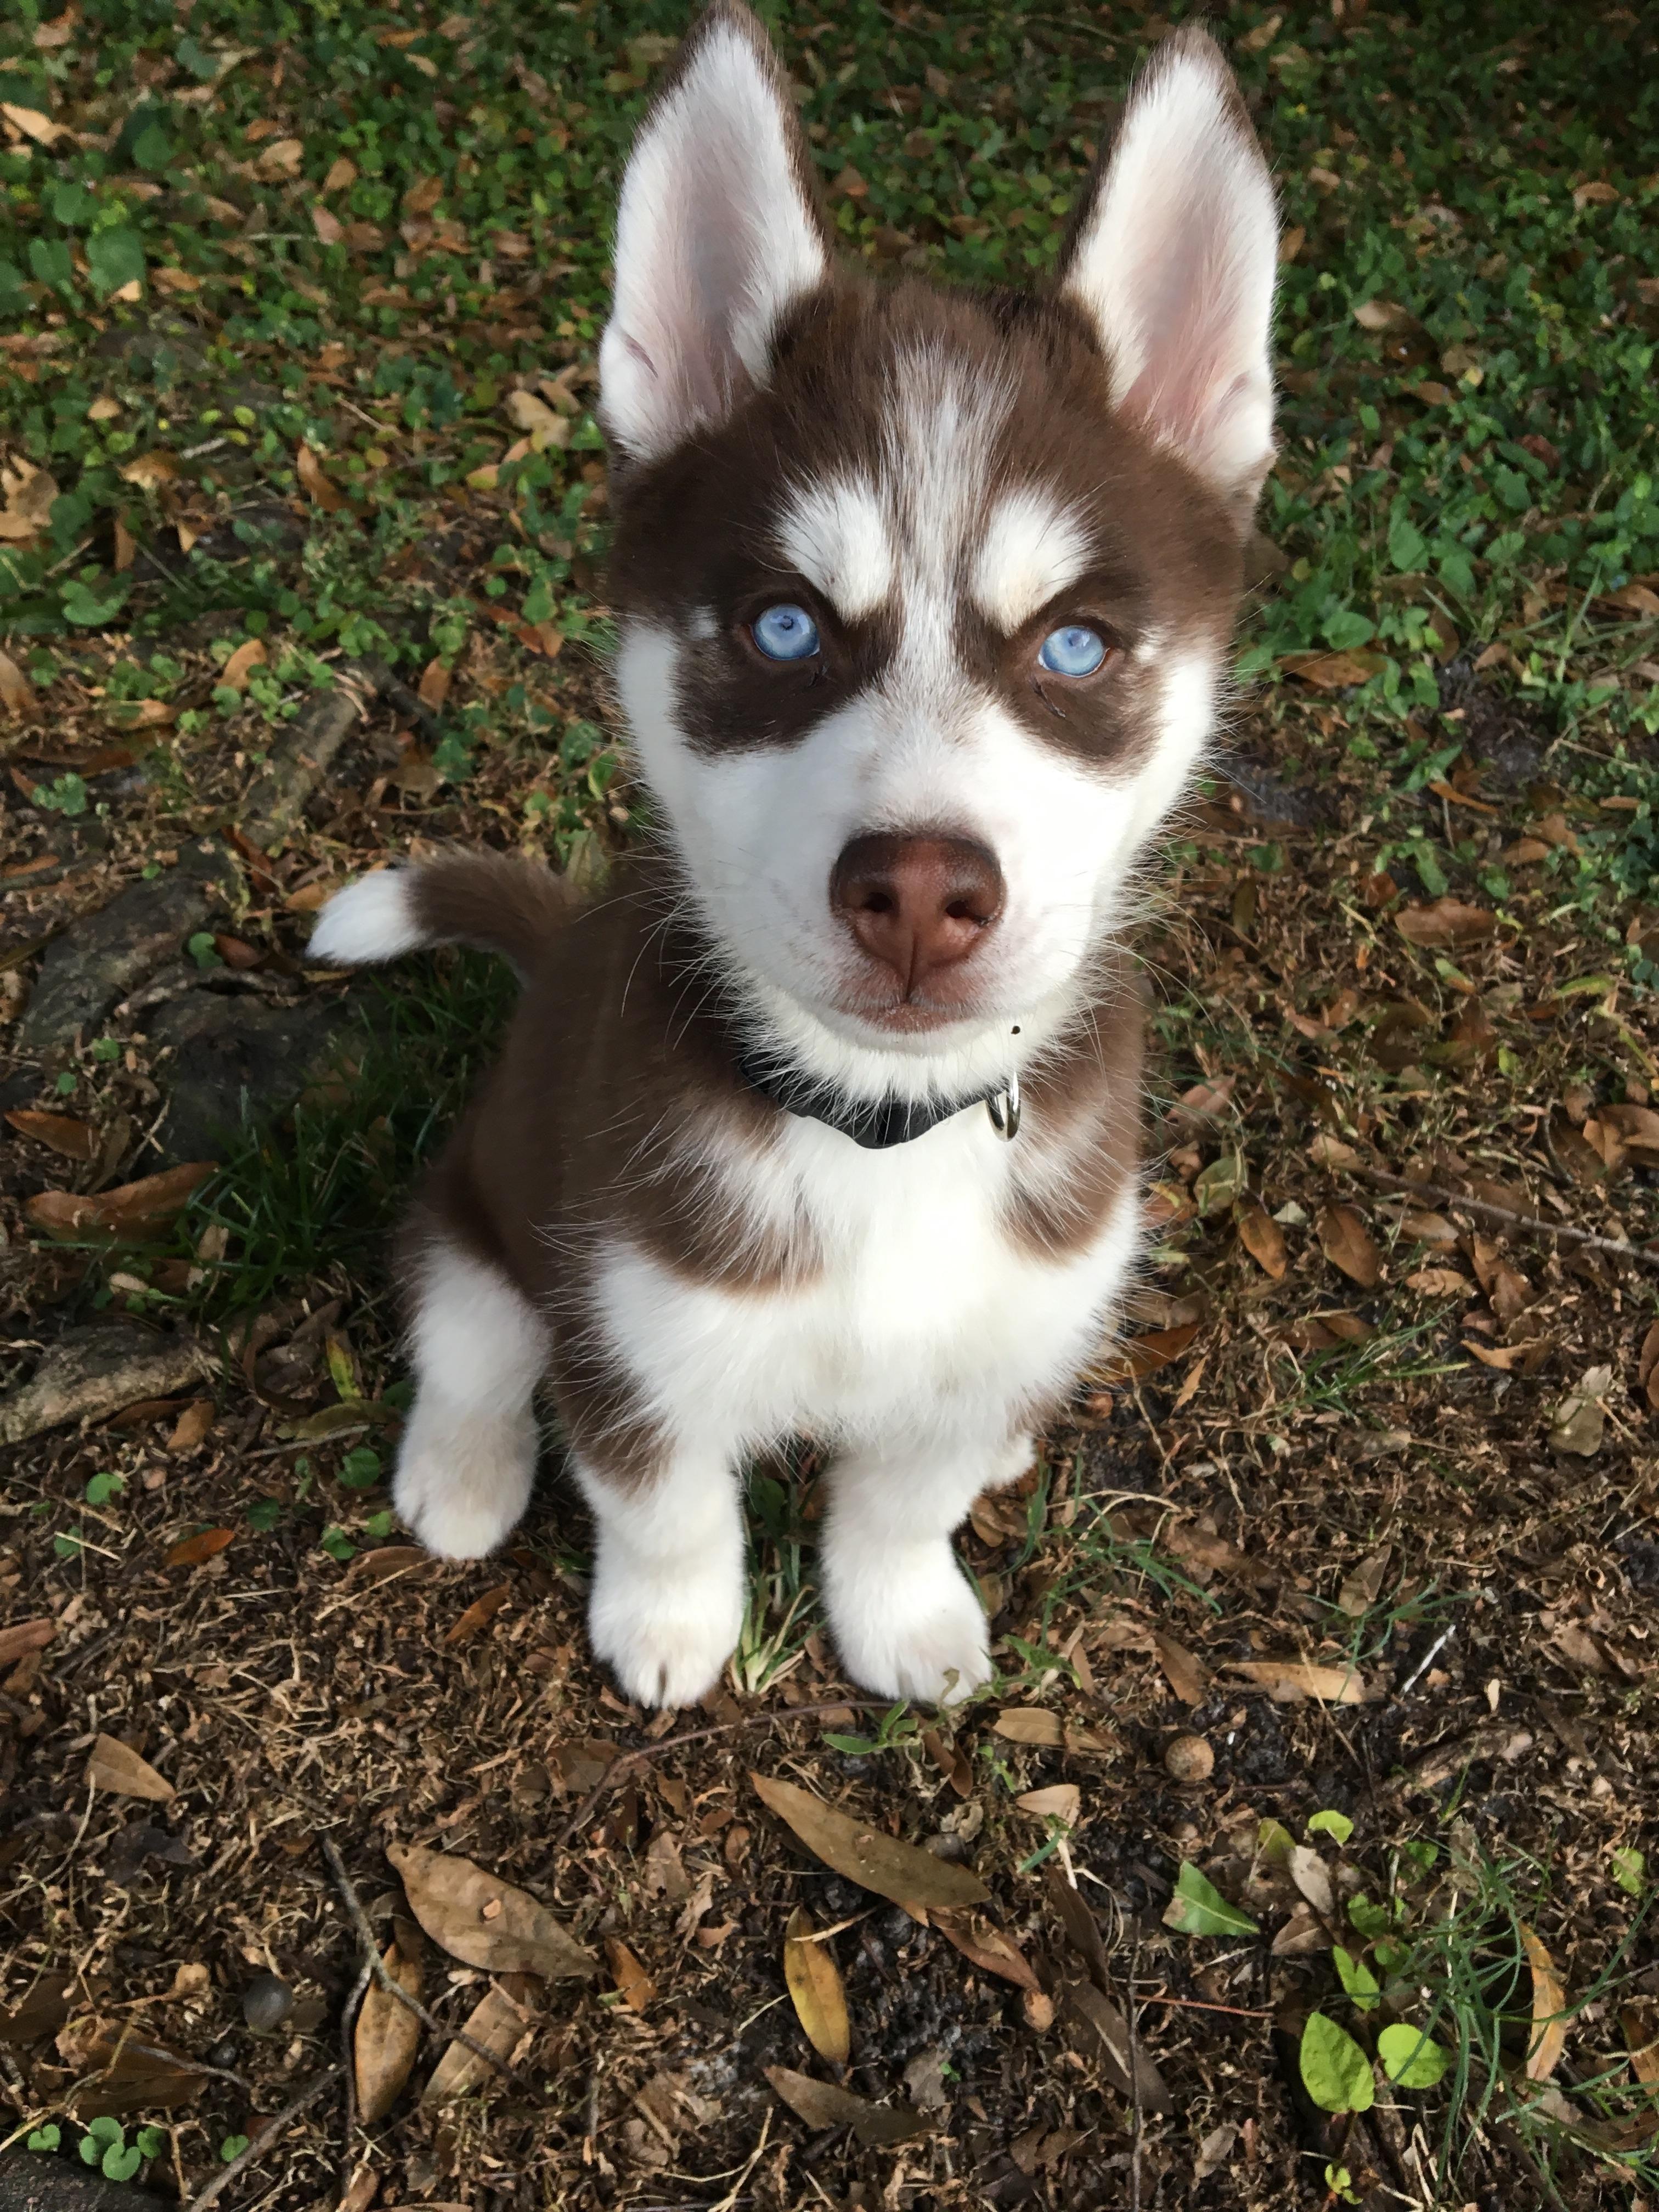 Hey guys meet my 3 month old husky puppy max!